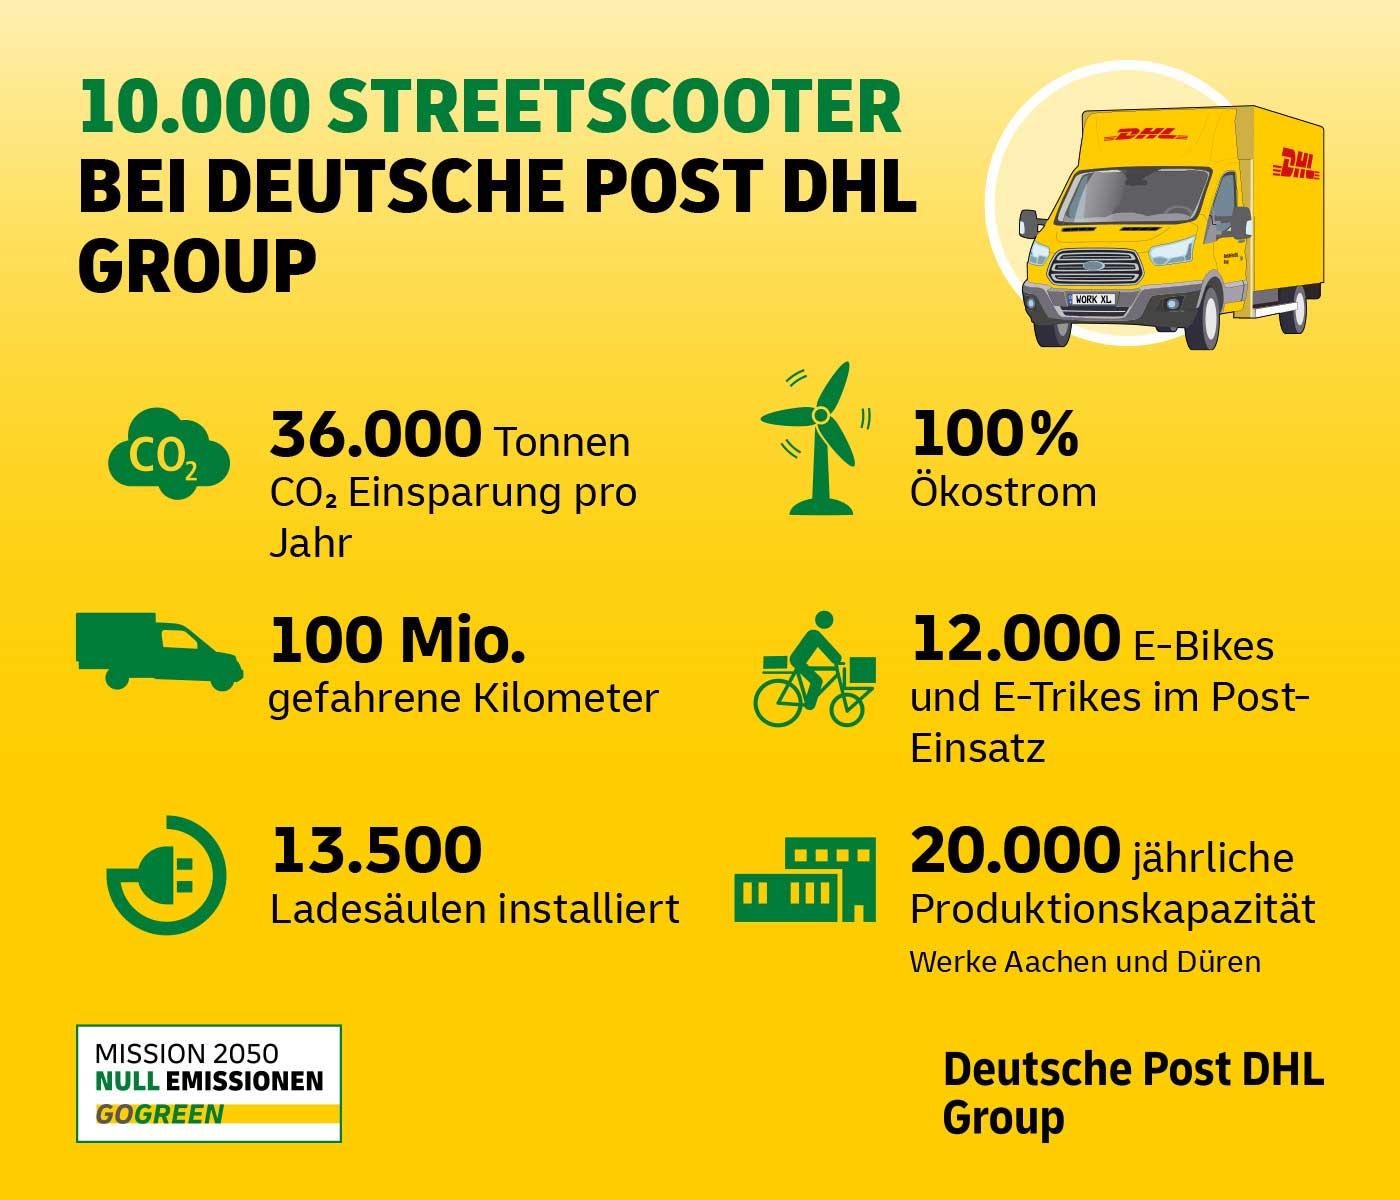 streetscooter-10000-de